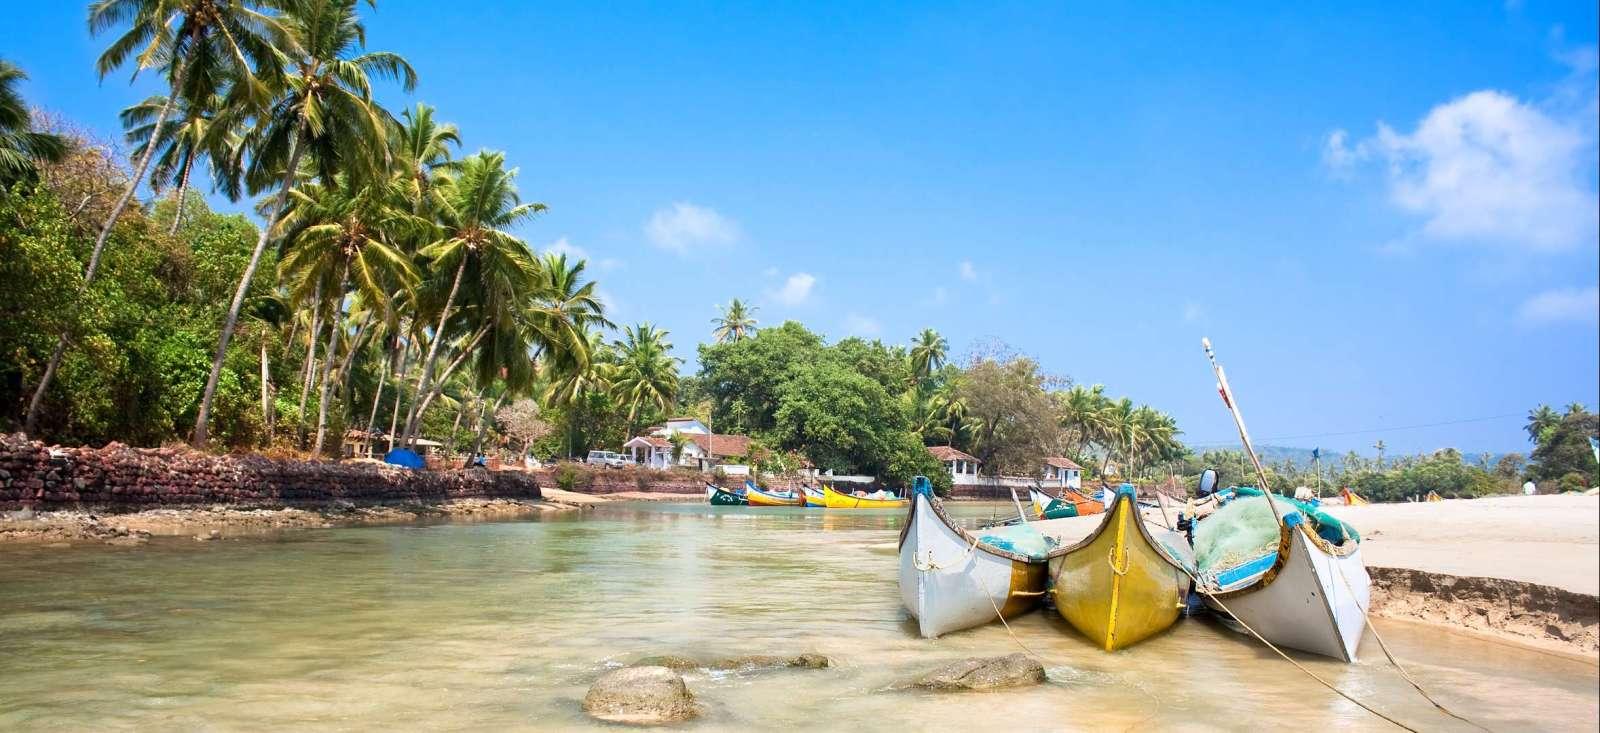 Voyage à pied : Inde : Karnataka et plages de Goa